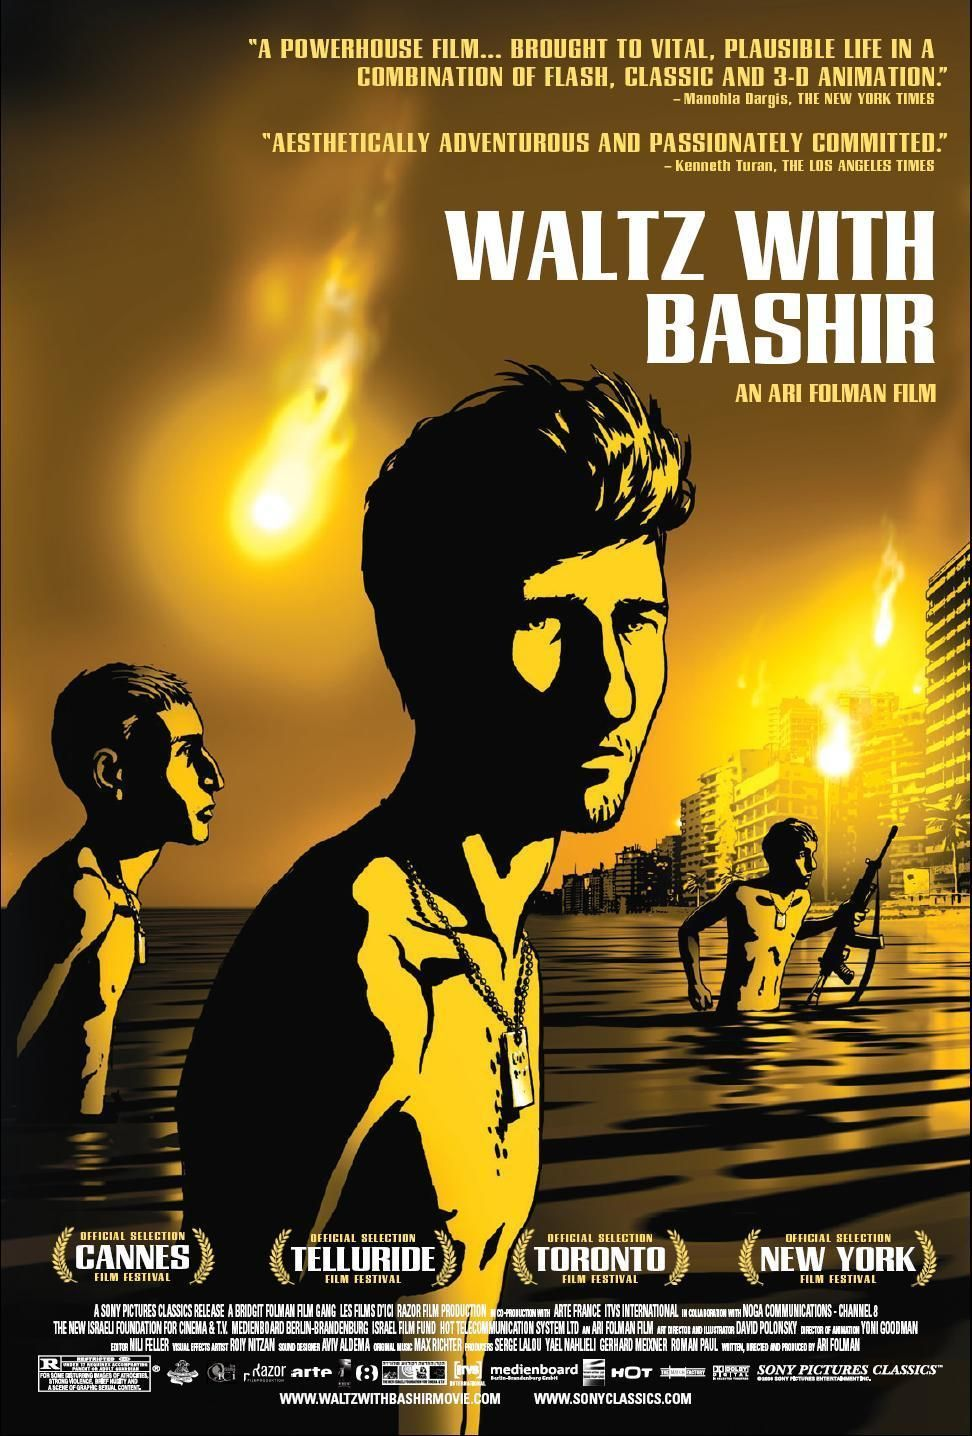 Waltz With Bashir 2008 En Espanol Vals Con Bashir Es Una